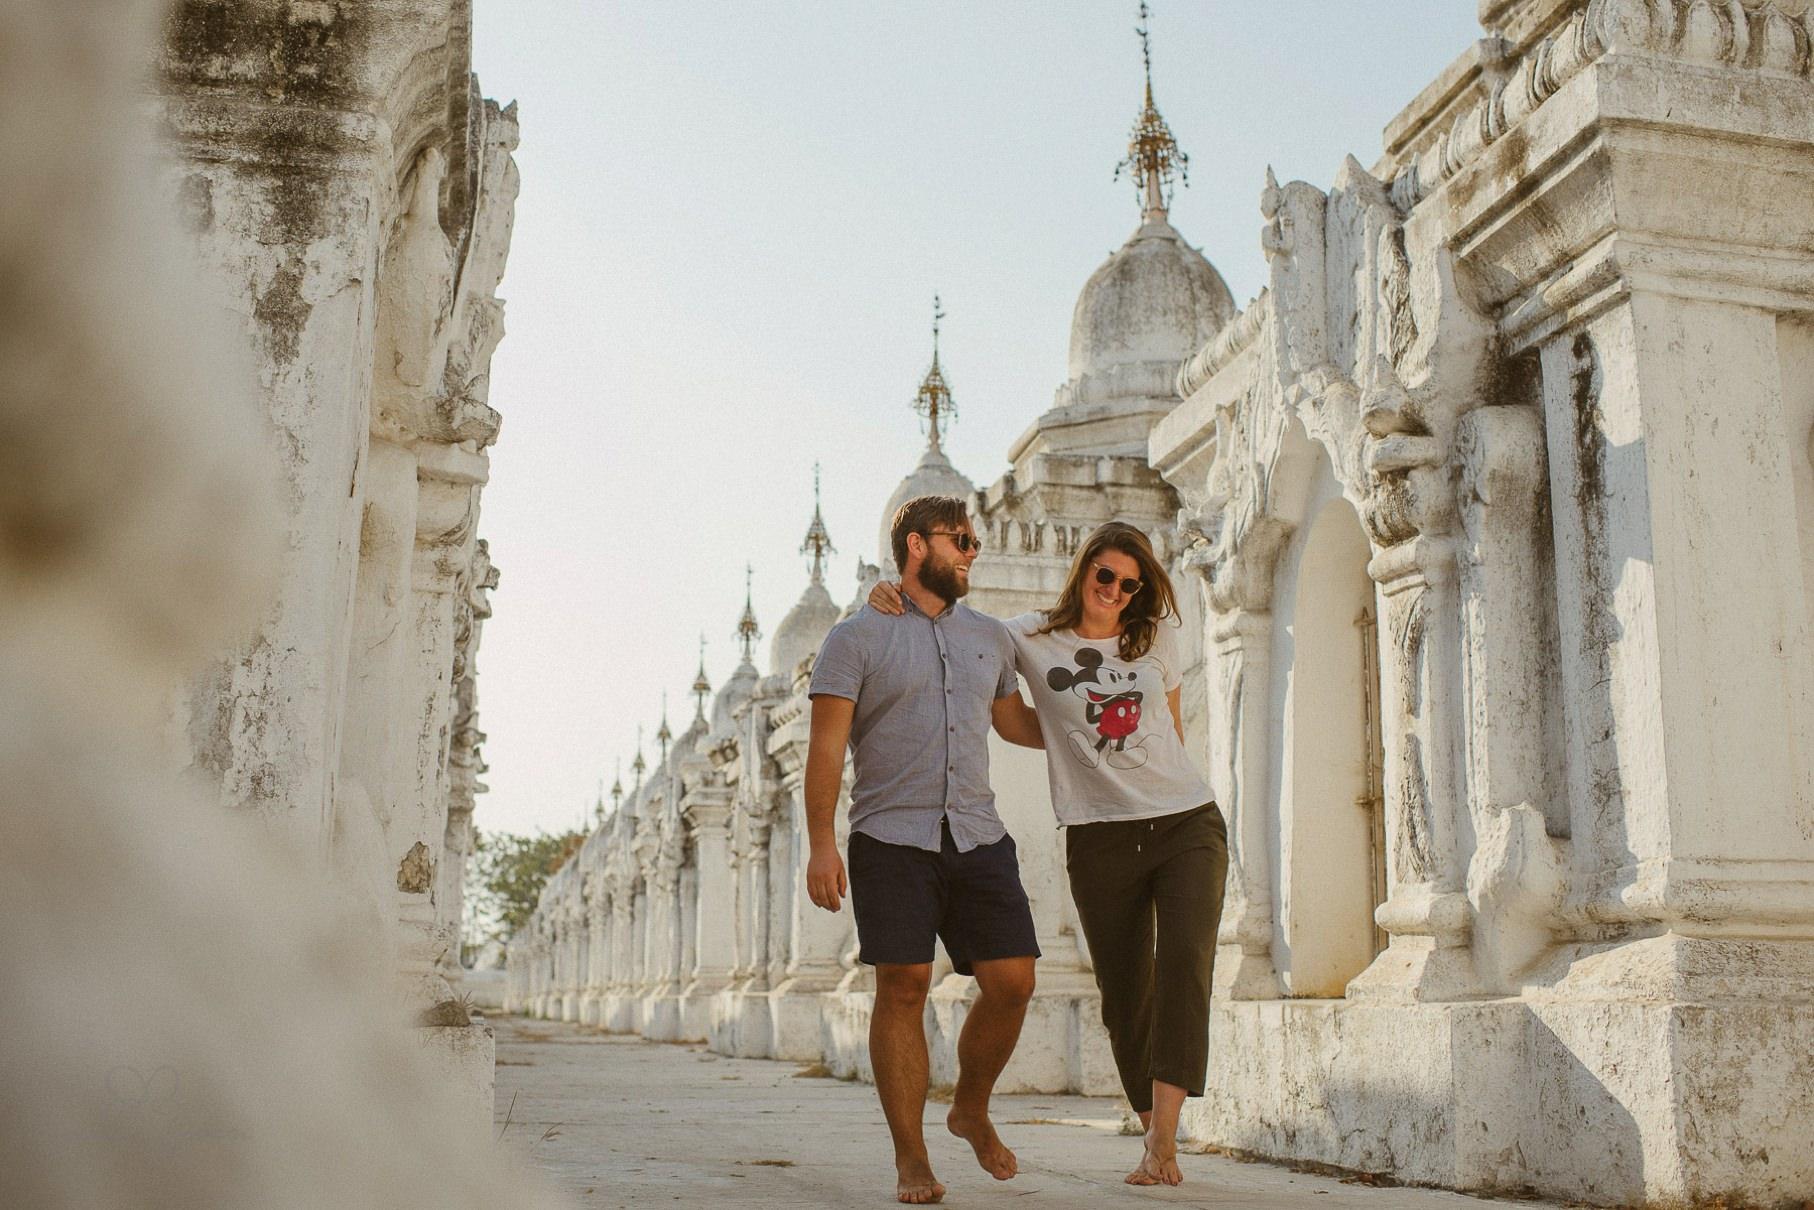 0044 yangon mandalay d76 6726 - Großstädte Myanmars - Yangon & Mandalay